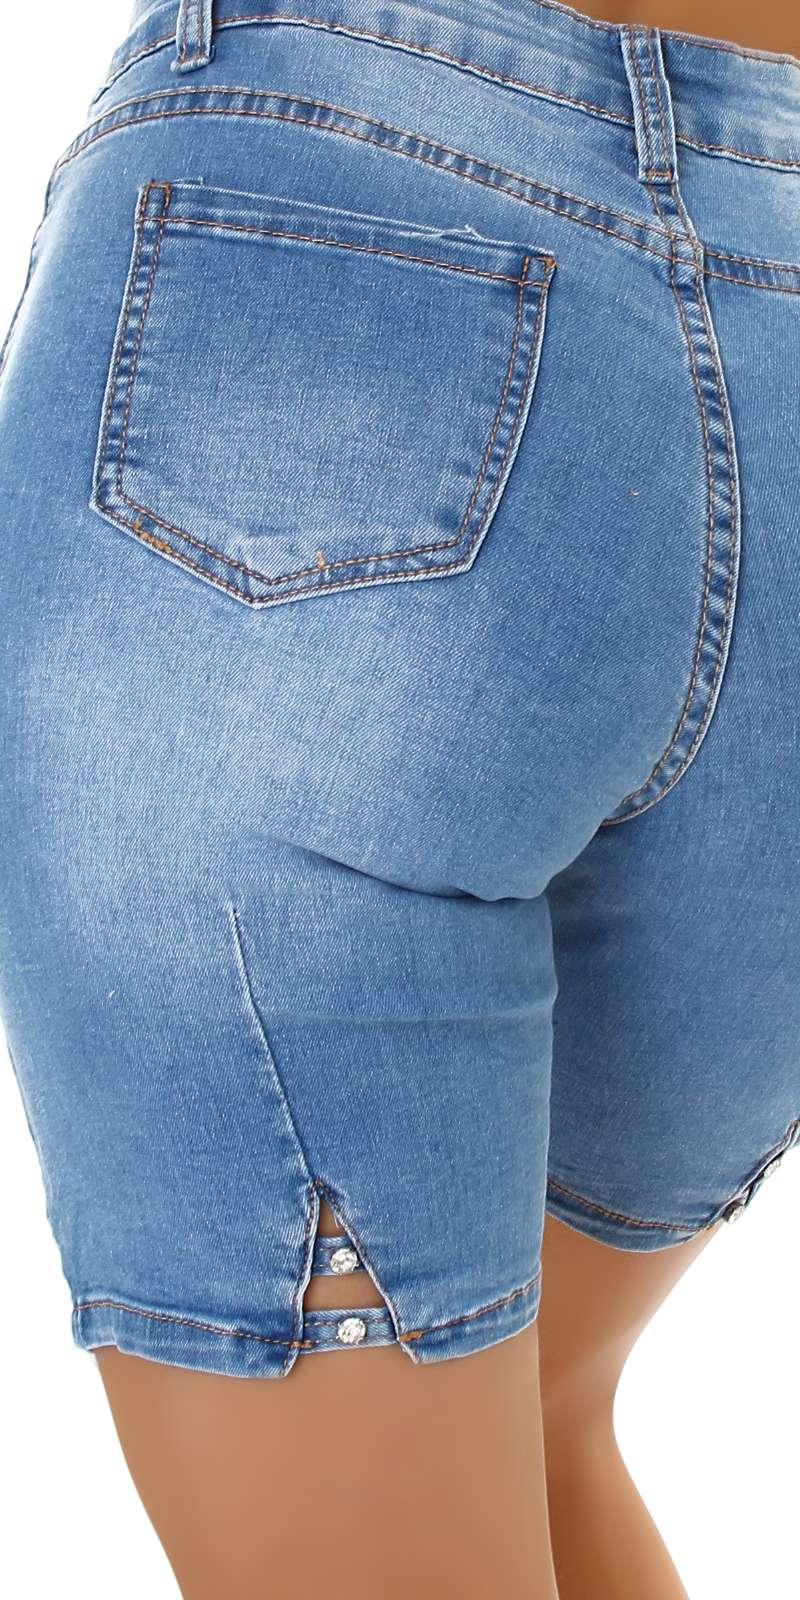 Jeans Shorts Erin